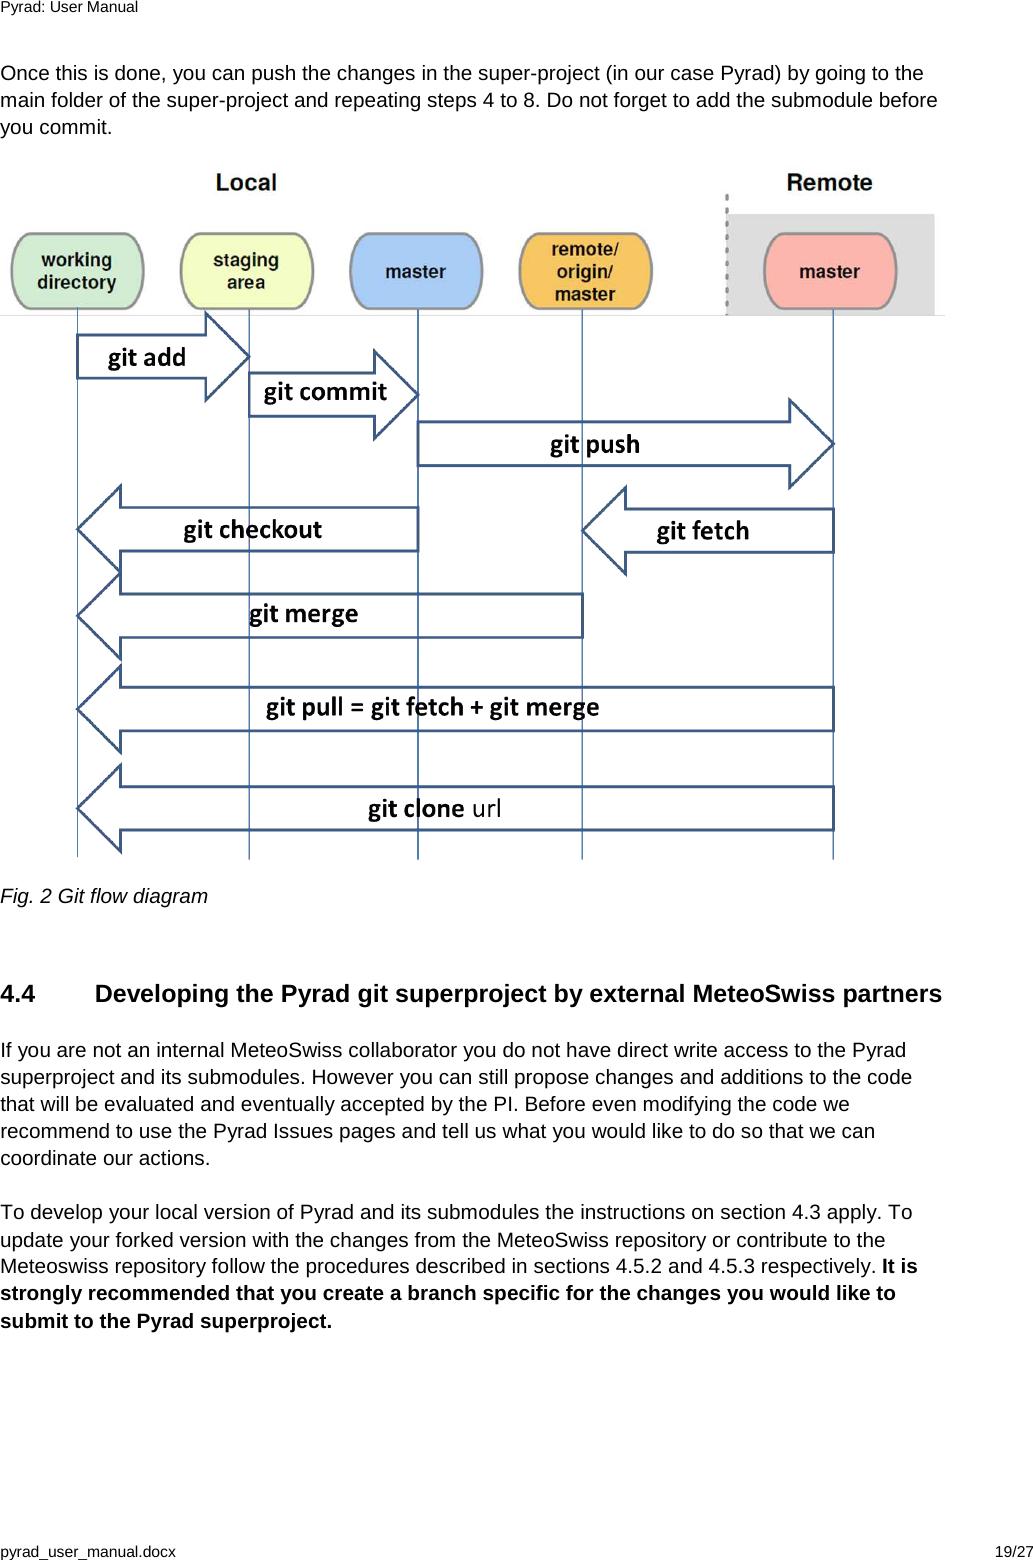 Standardberichtsvorlage ( Anpassen In Registerkarte Start